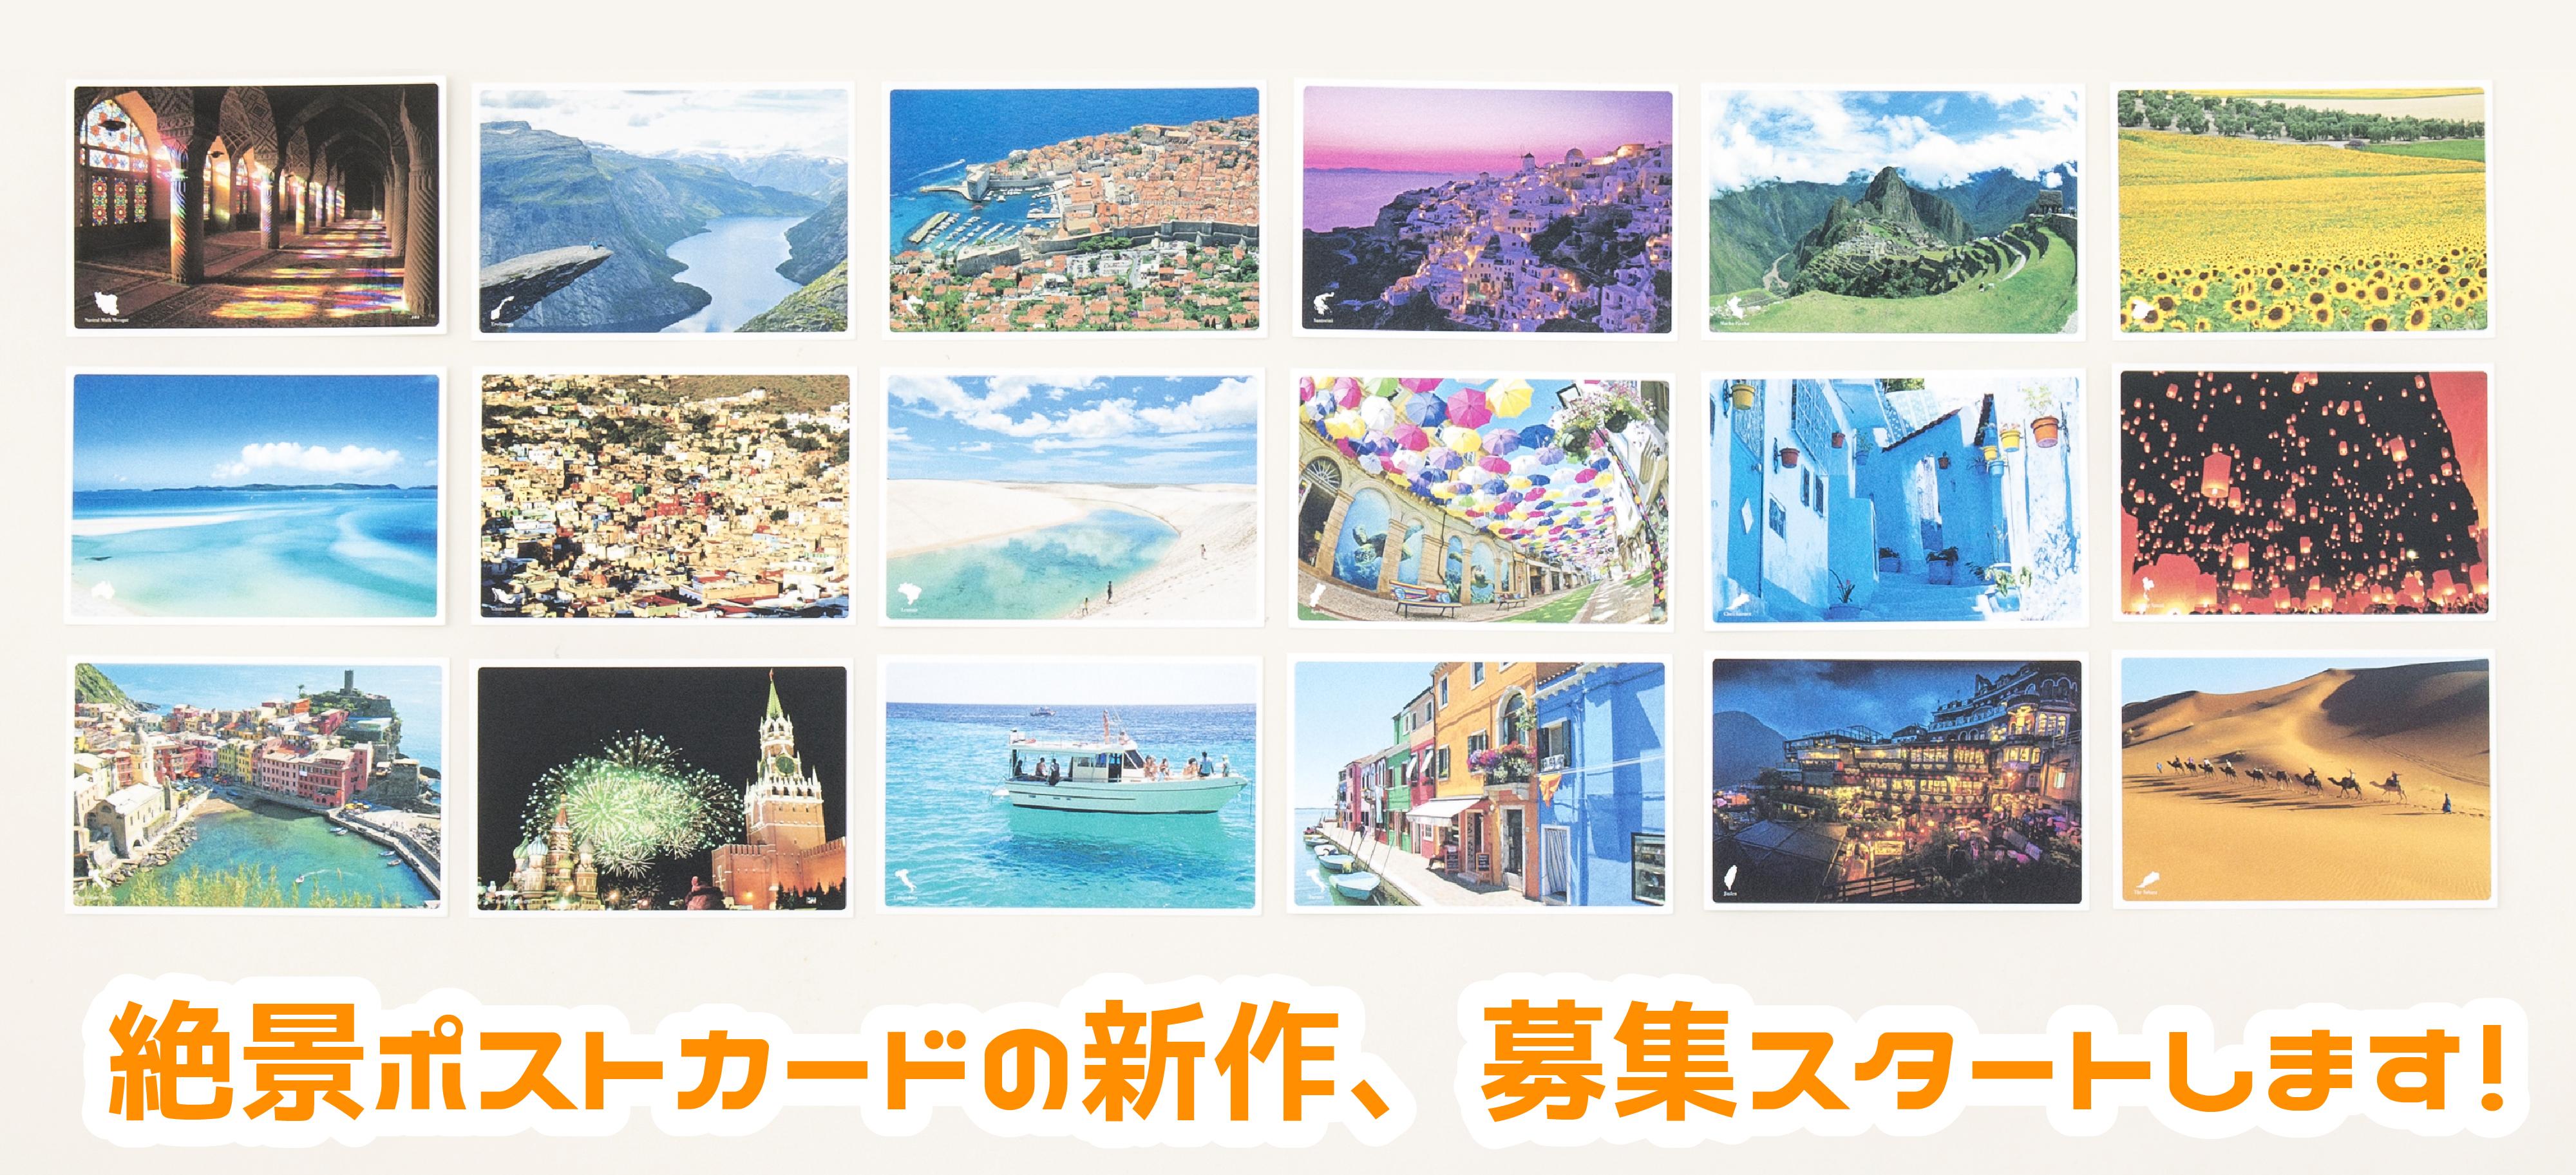 postcard2-01